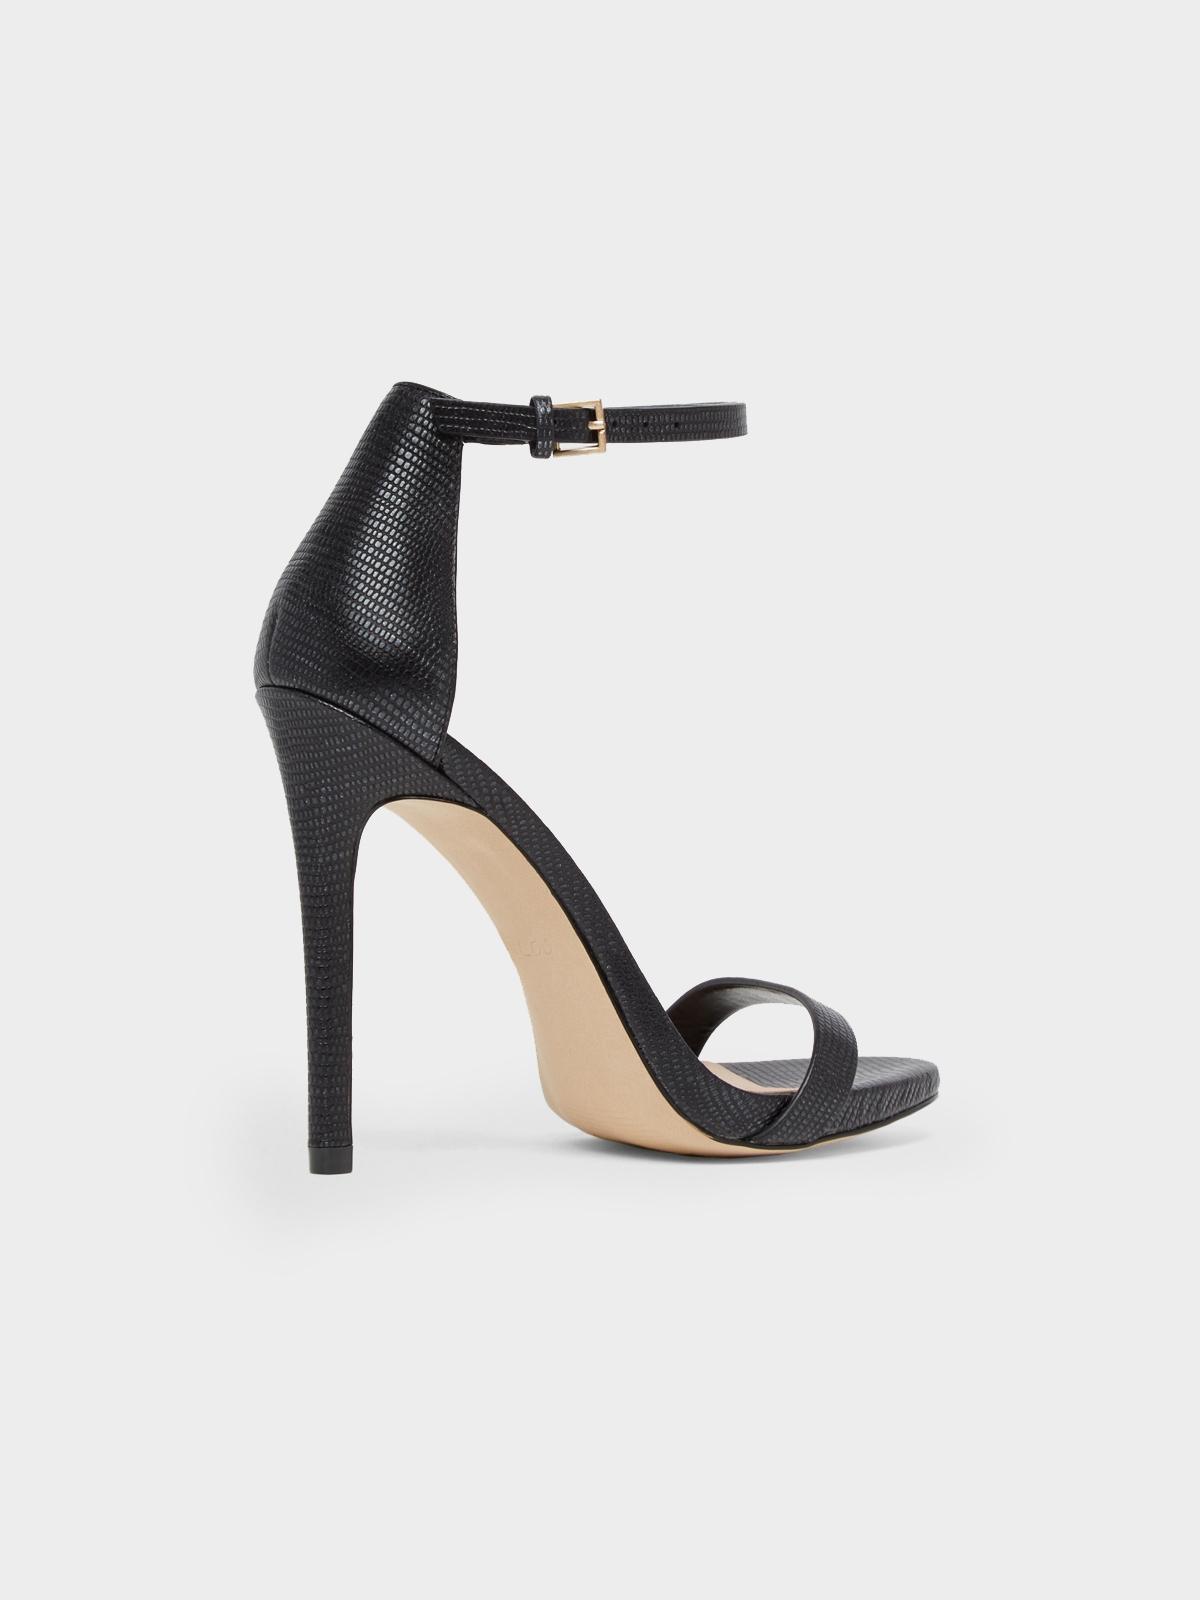 Aldo Caraa Heels Black